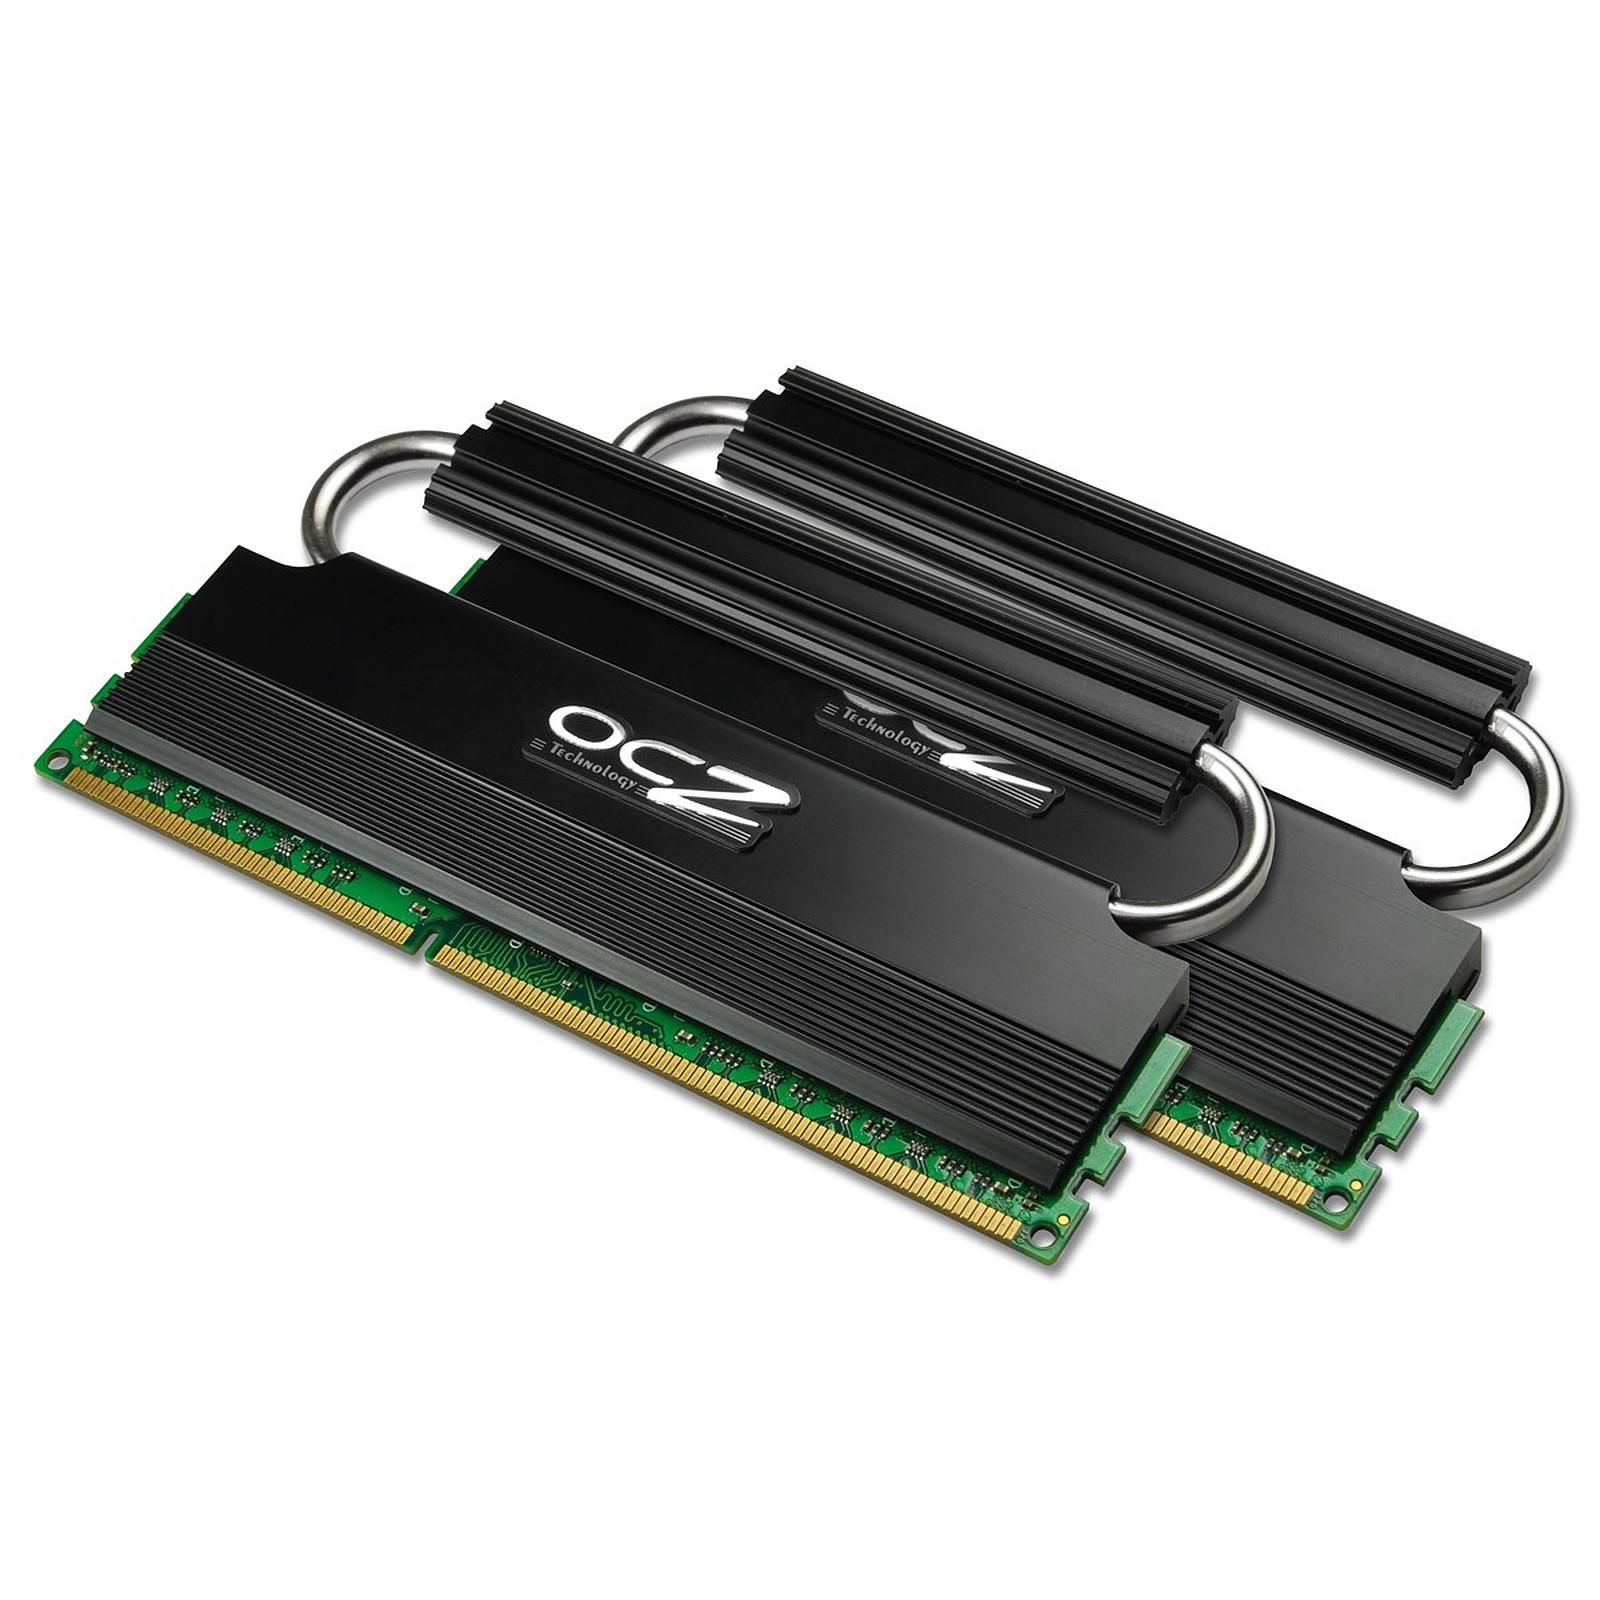 OCZ Reaper HPC 8 Go (2x 4Go) DDR3 1600 MHz